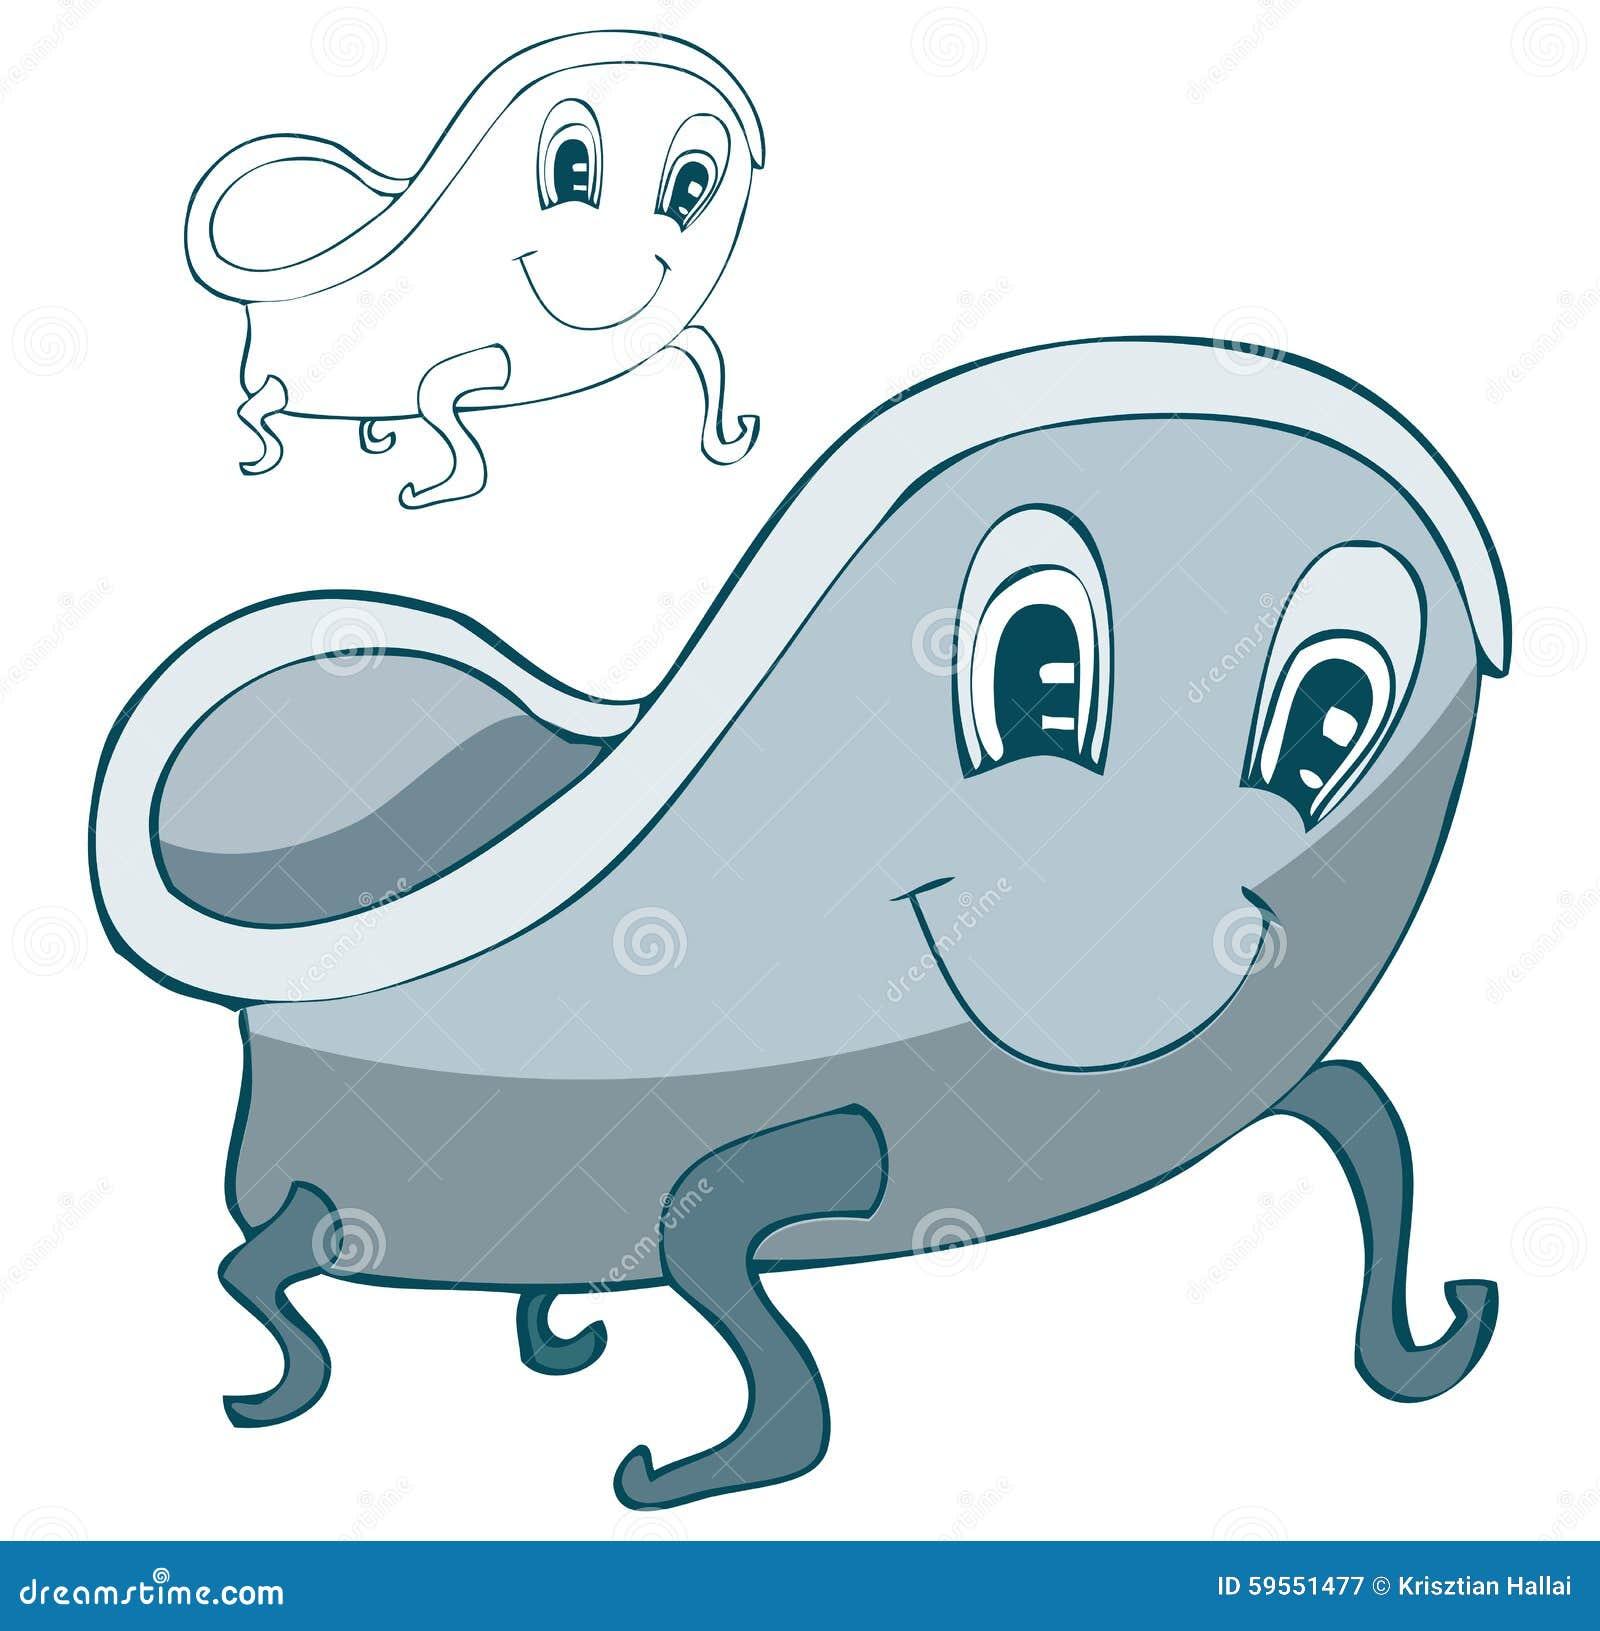 bathtub cartoon. Cartoon Bathtub Vector Illustration  Stock Image